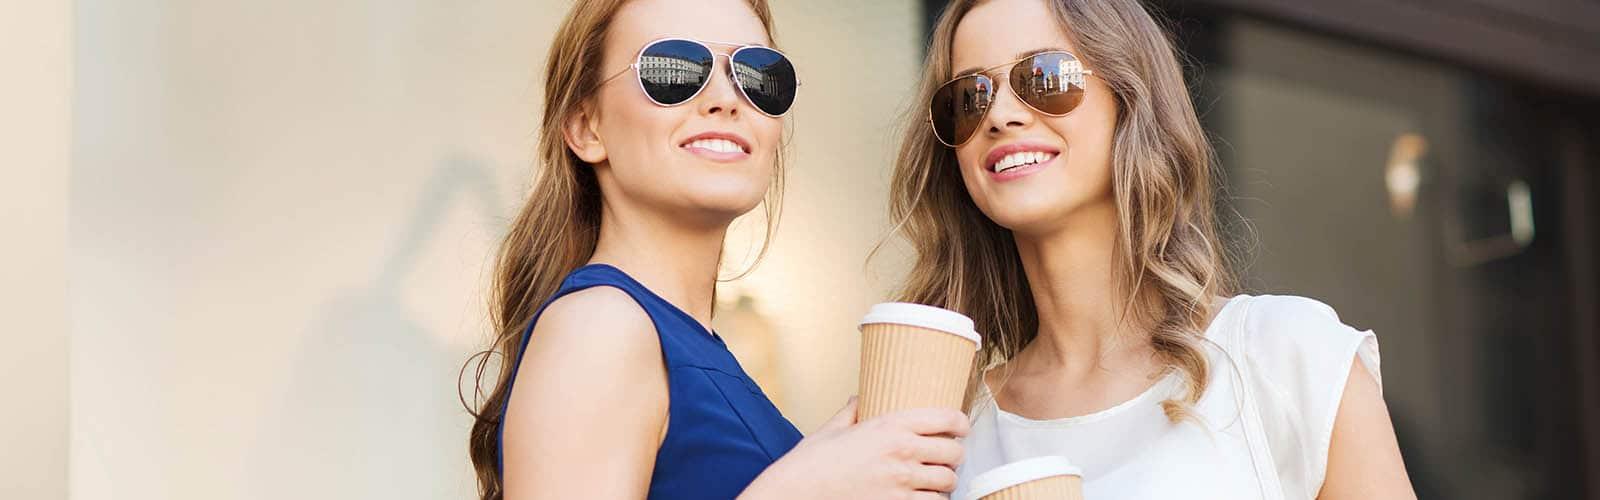 koffiebekers-groothandel-service-disposables-kwaliteit